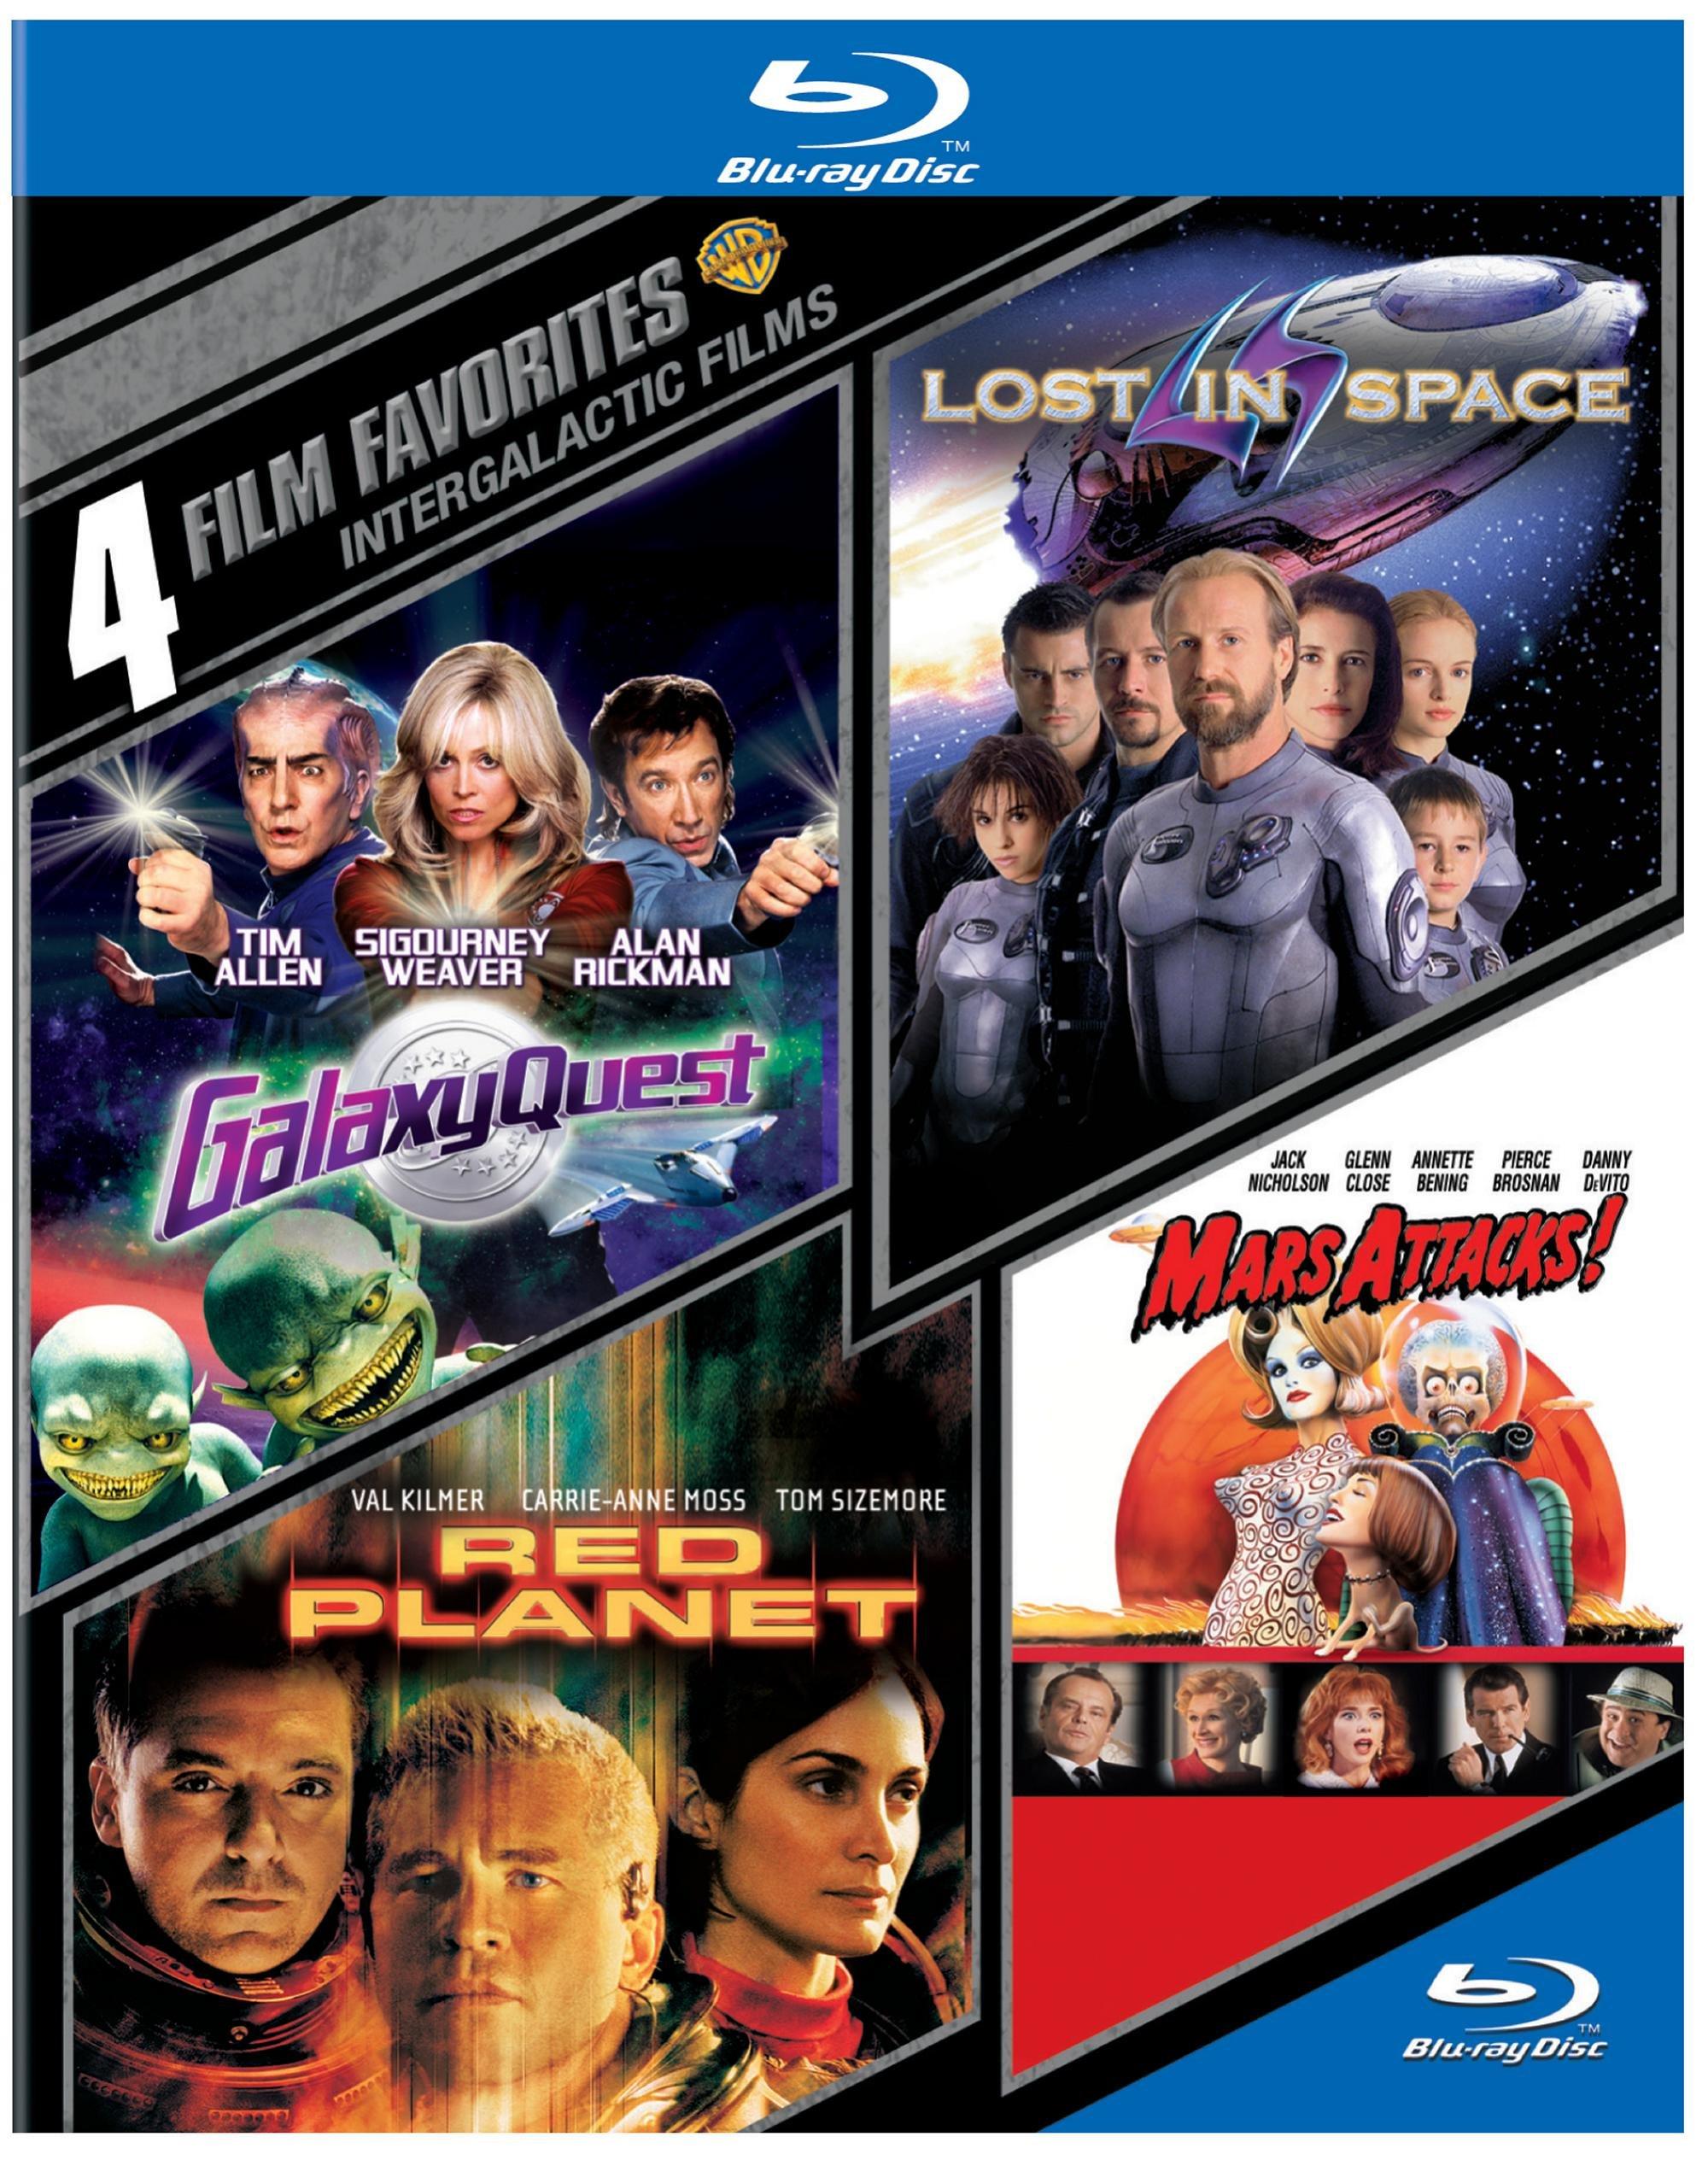 4 Film Favorites: Intergalactic Films (BD)(4FF) [Blu-ray]